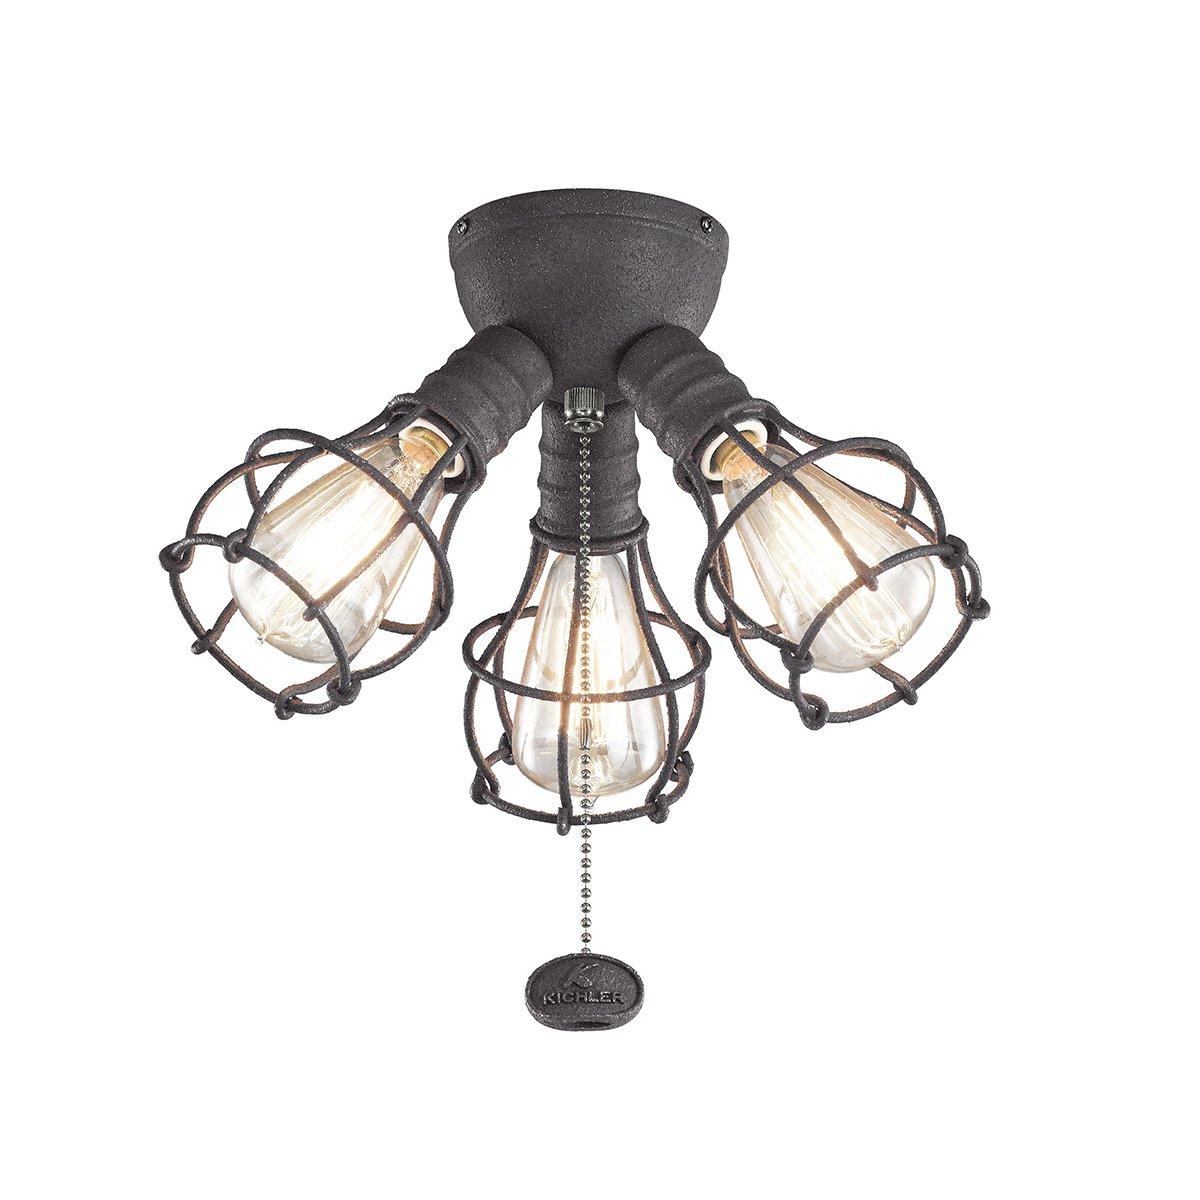 kichler 370041dbk three light fan light kit amazon com